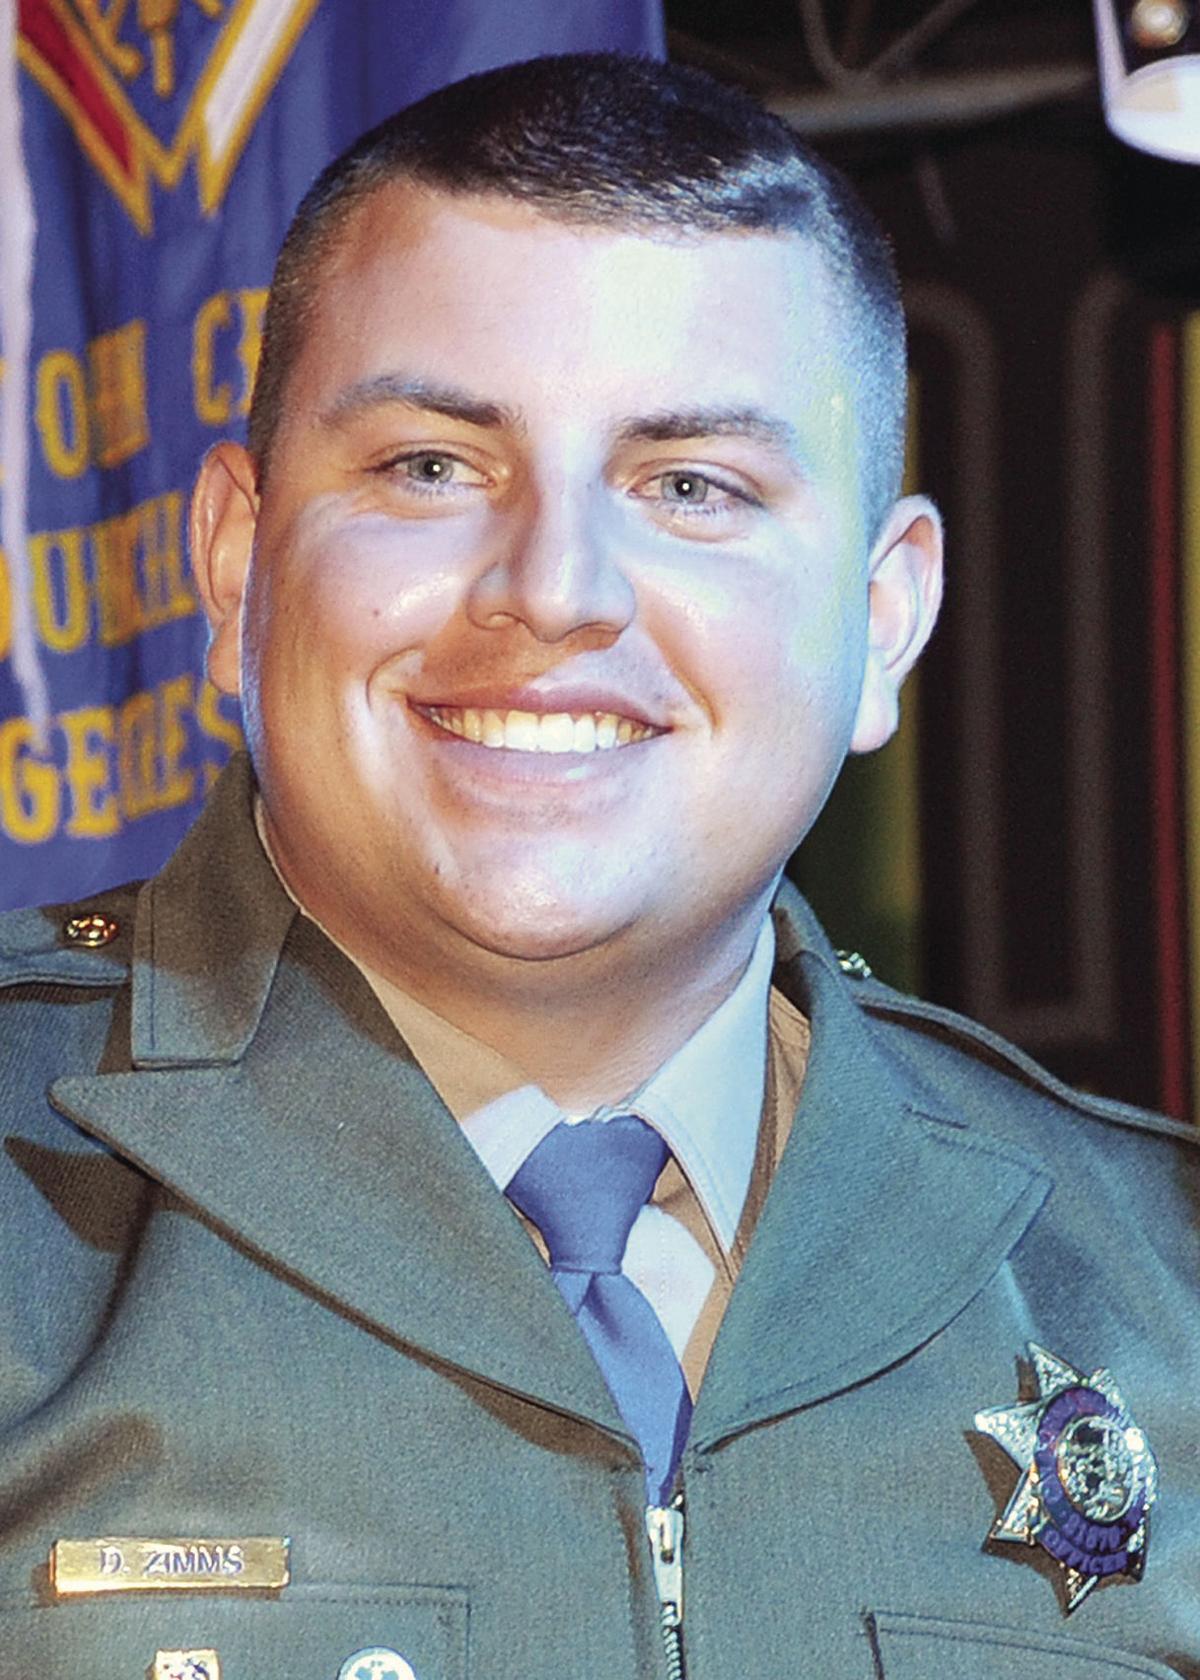 California Highway Patrol Officer Daniel Zimms